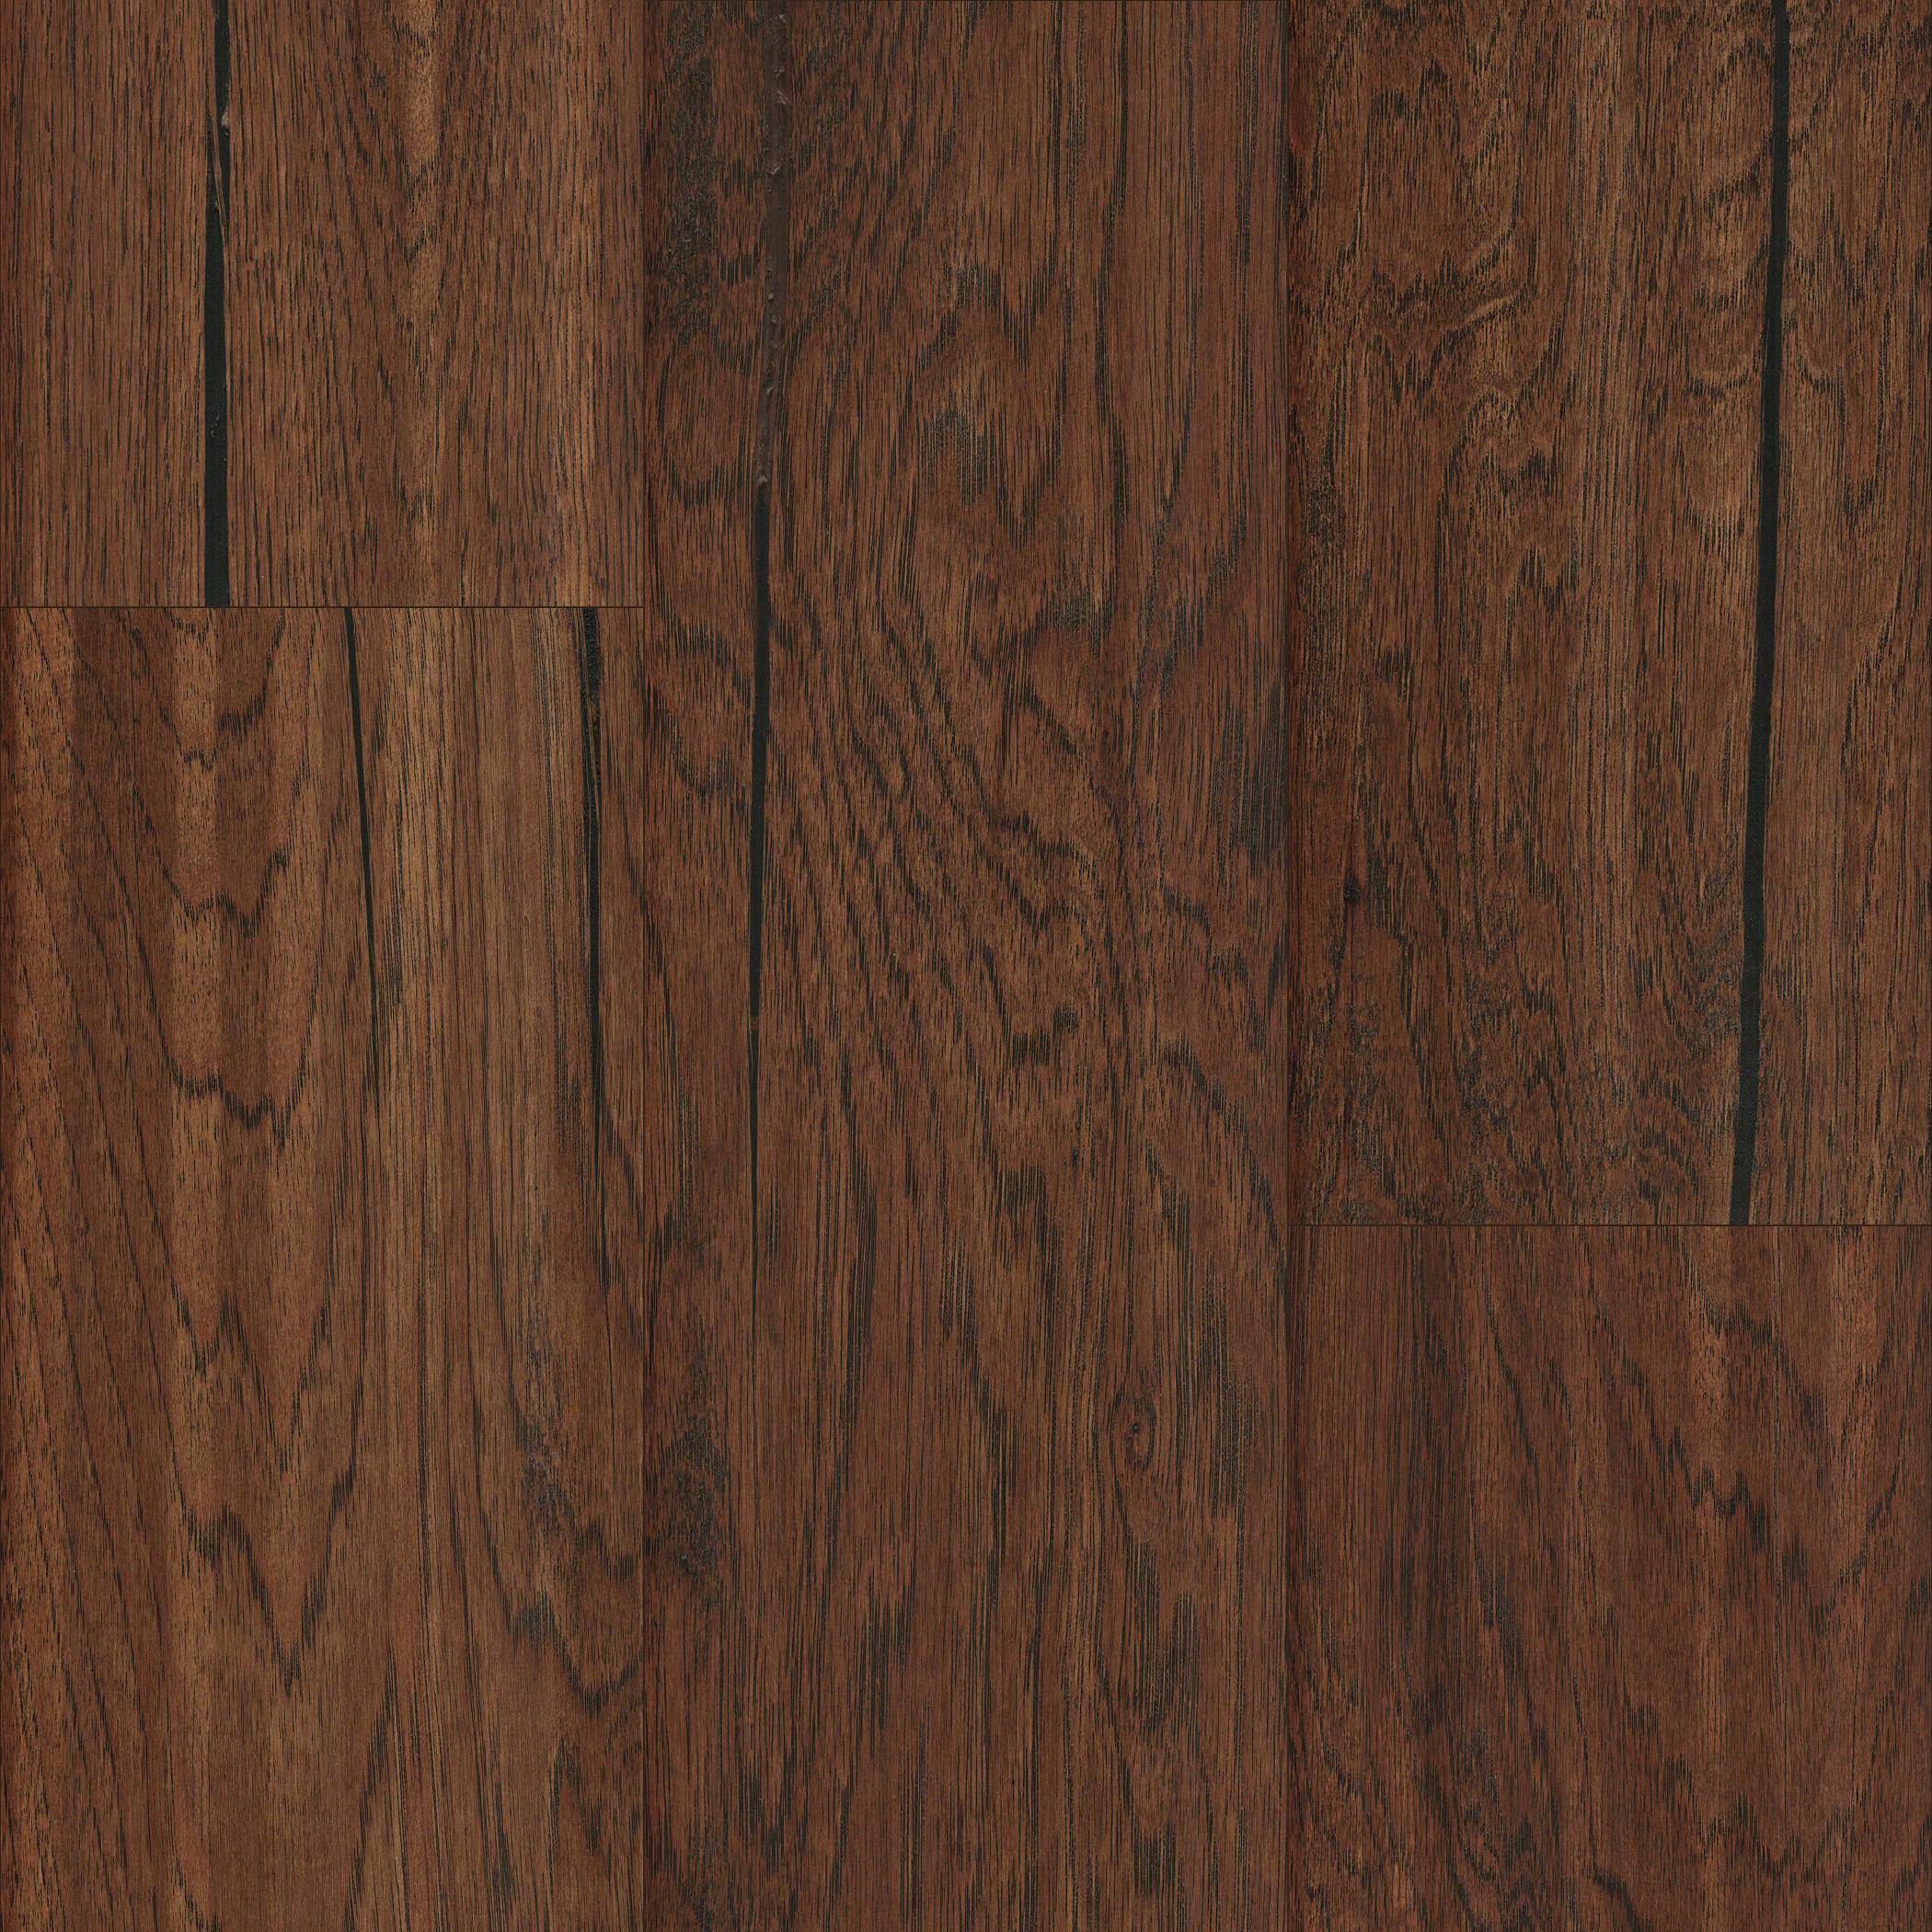 21 Amazing Bruce Glue Down Hardwood Floors